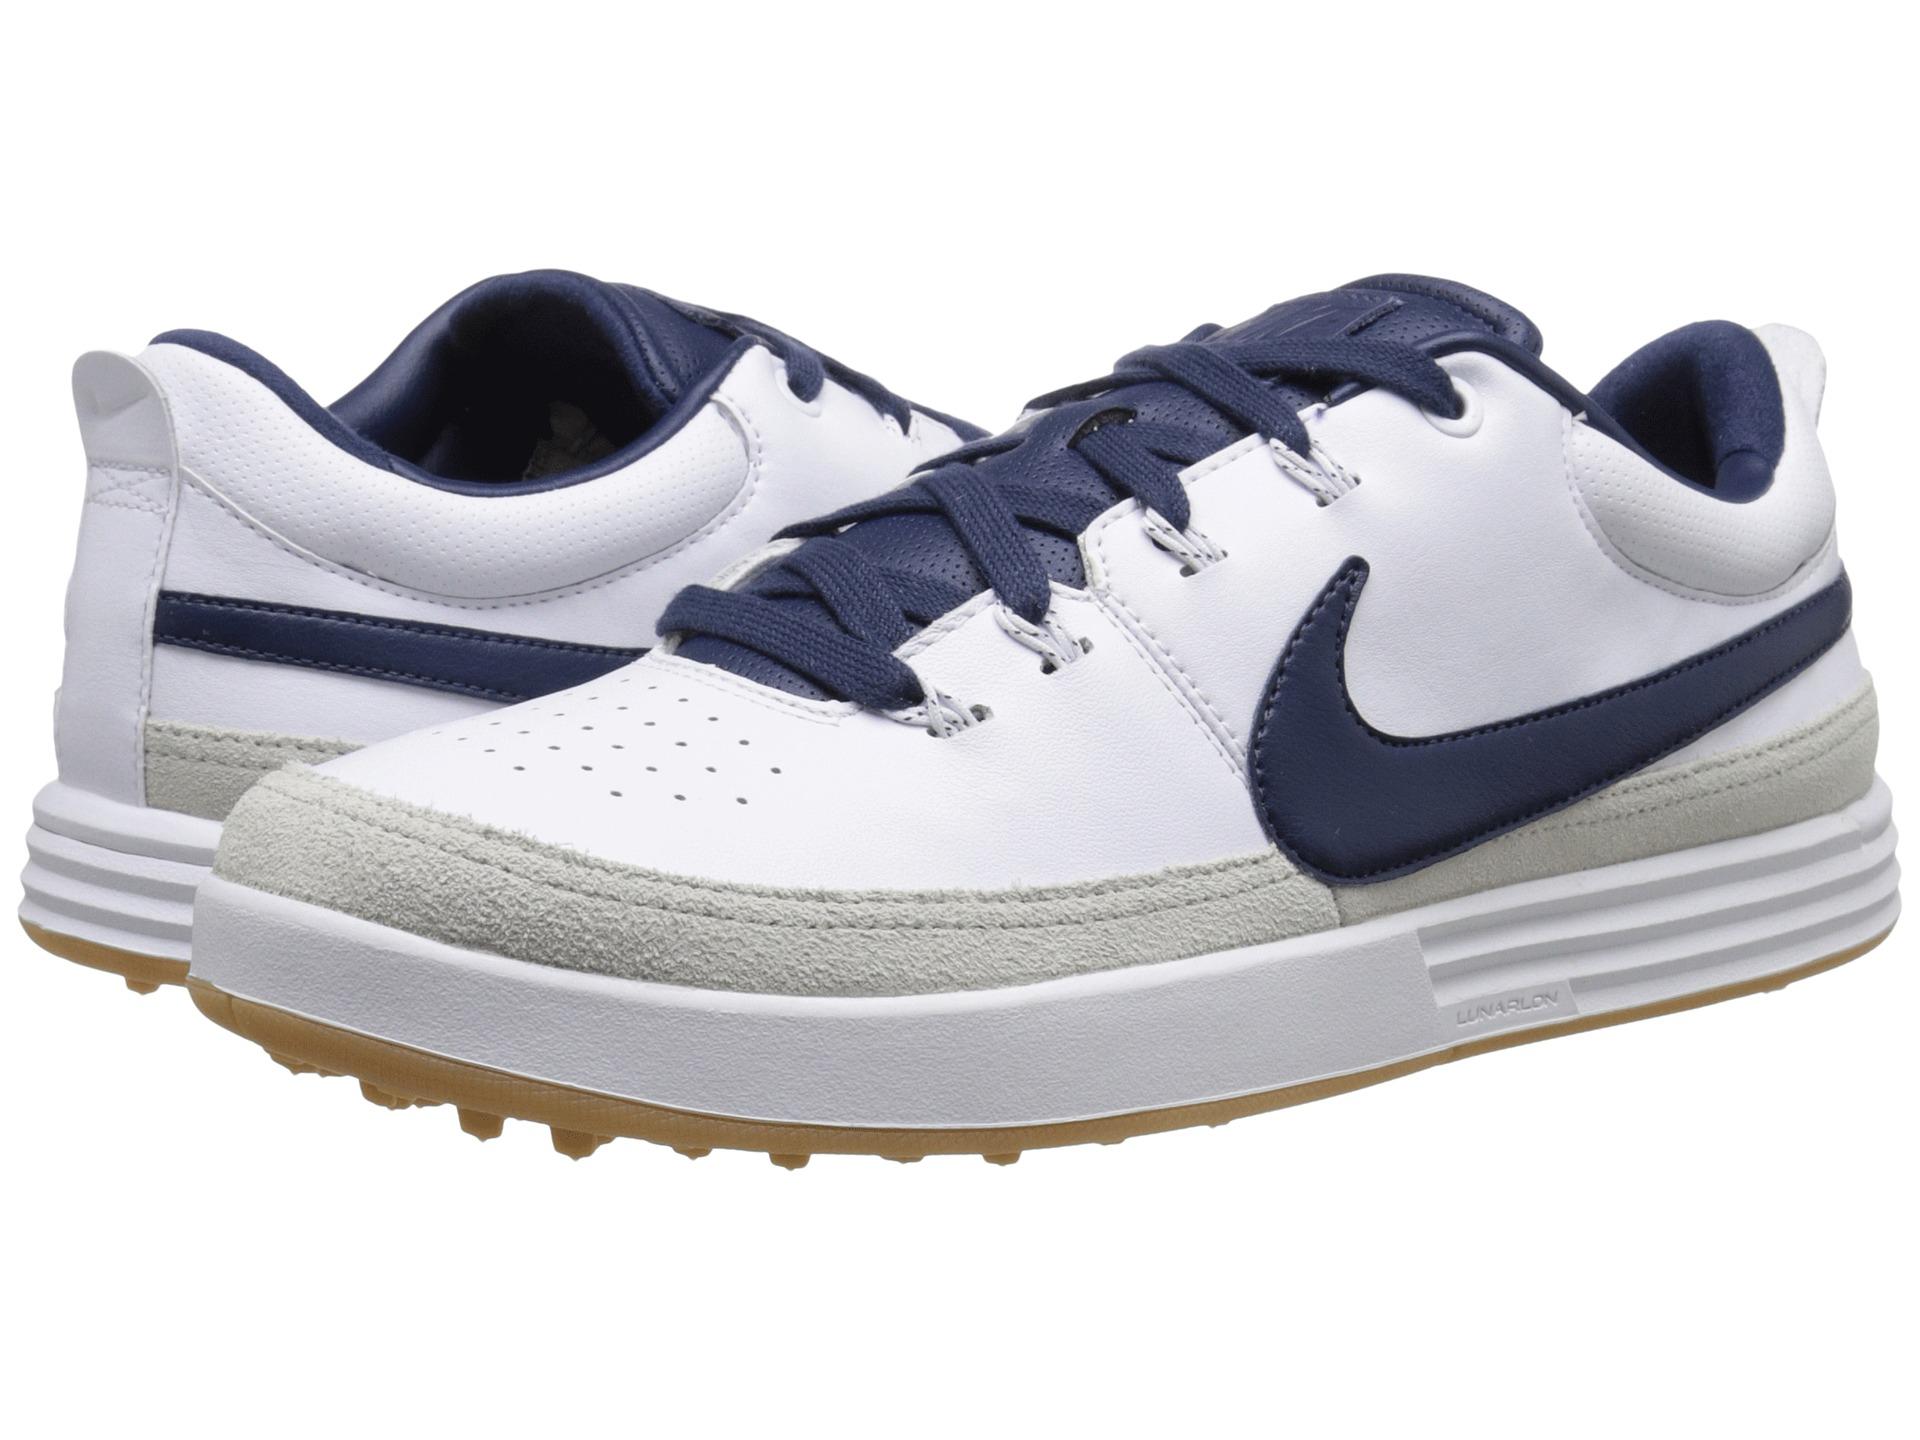 Nike Lunar Waverly Golf Shoes White